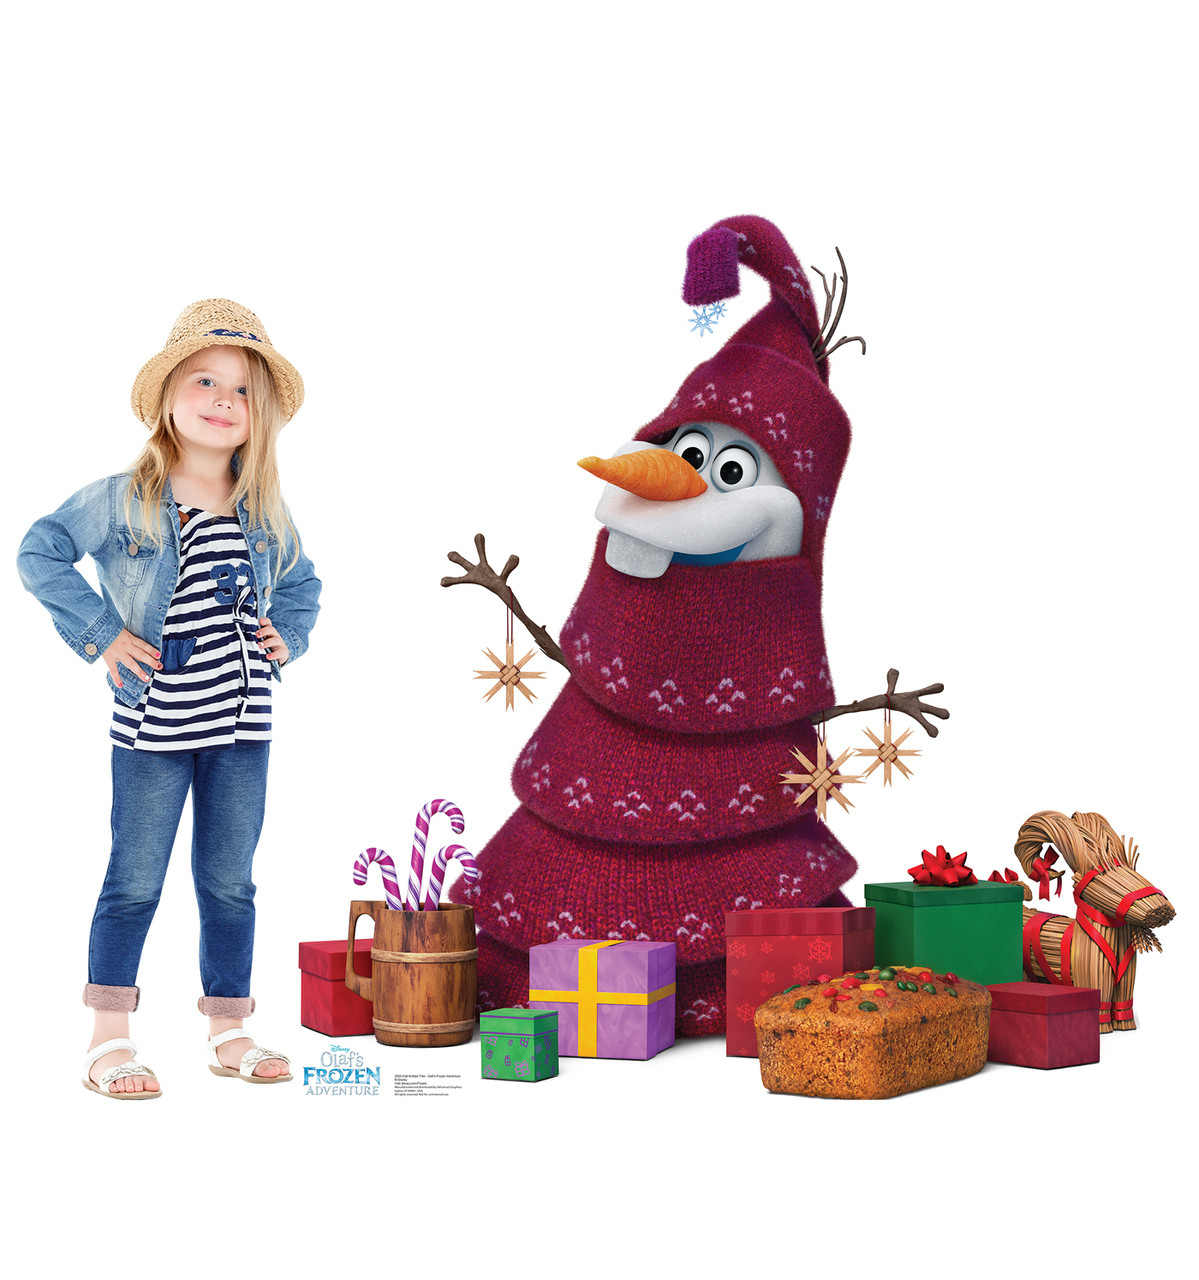 Olaf Knitted Tree (Olafs Frozen Adventure) | Cardboard Cutout 3